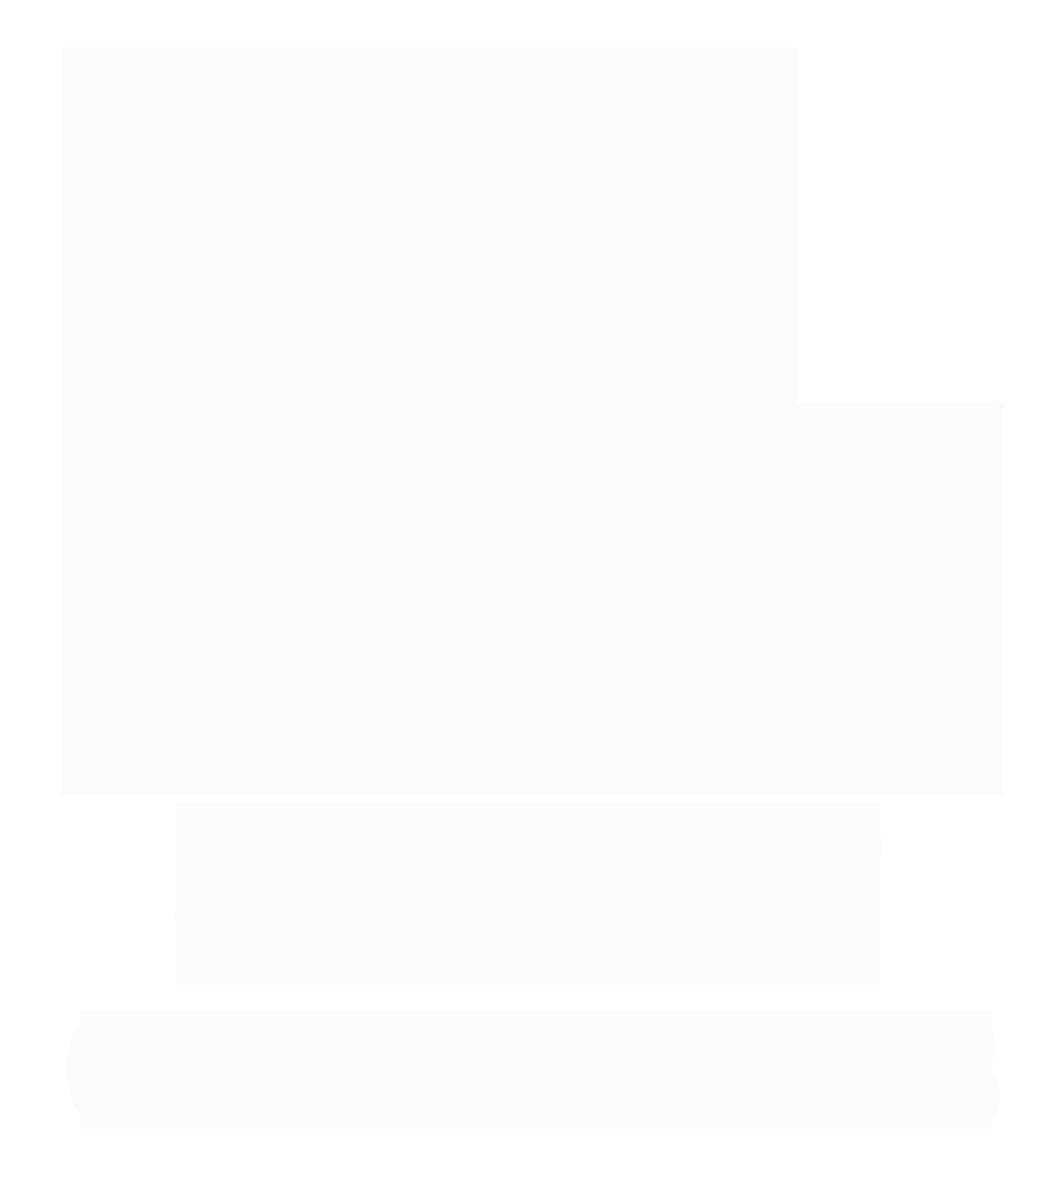 casa-rural-logo.png